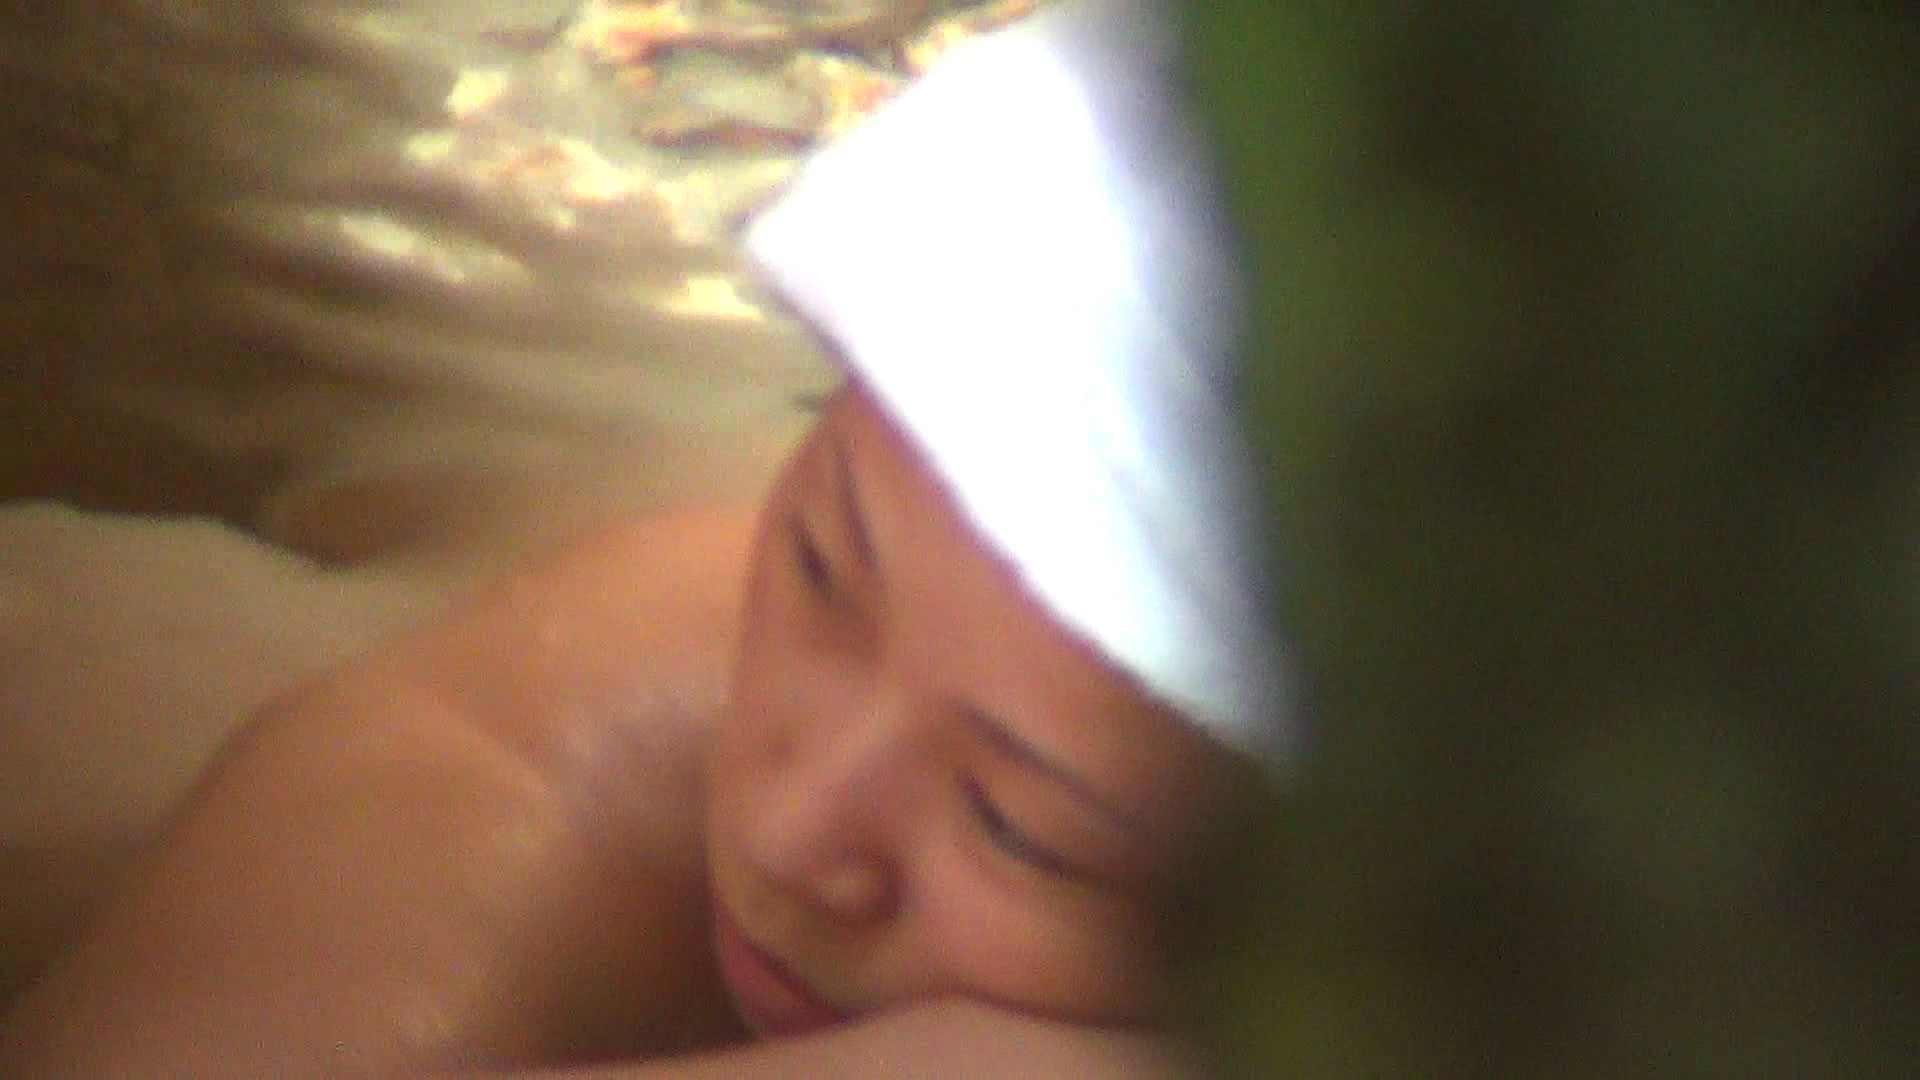 Vol.51 醤油j顔のお女市さん 胸の割りに下半身はがっちりタイプ OL | 美女達のヌード  95連発 34